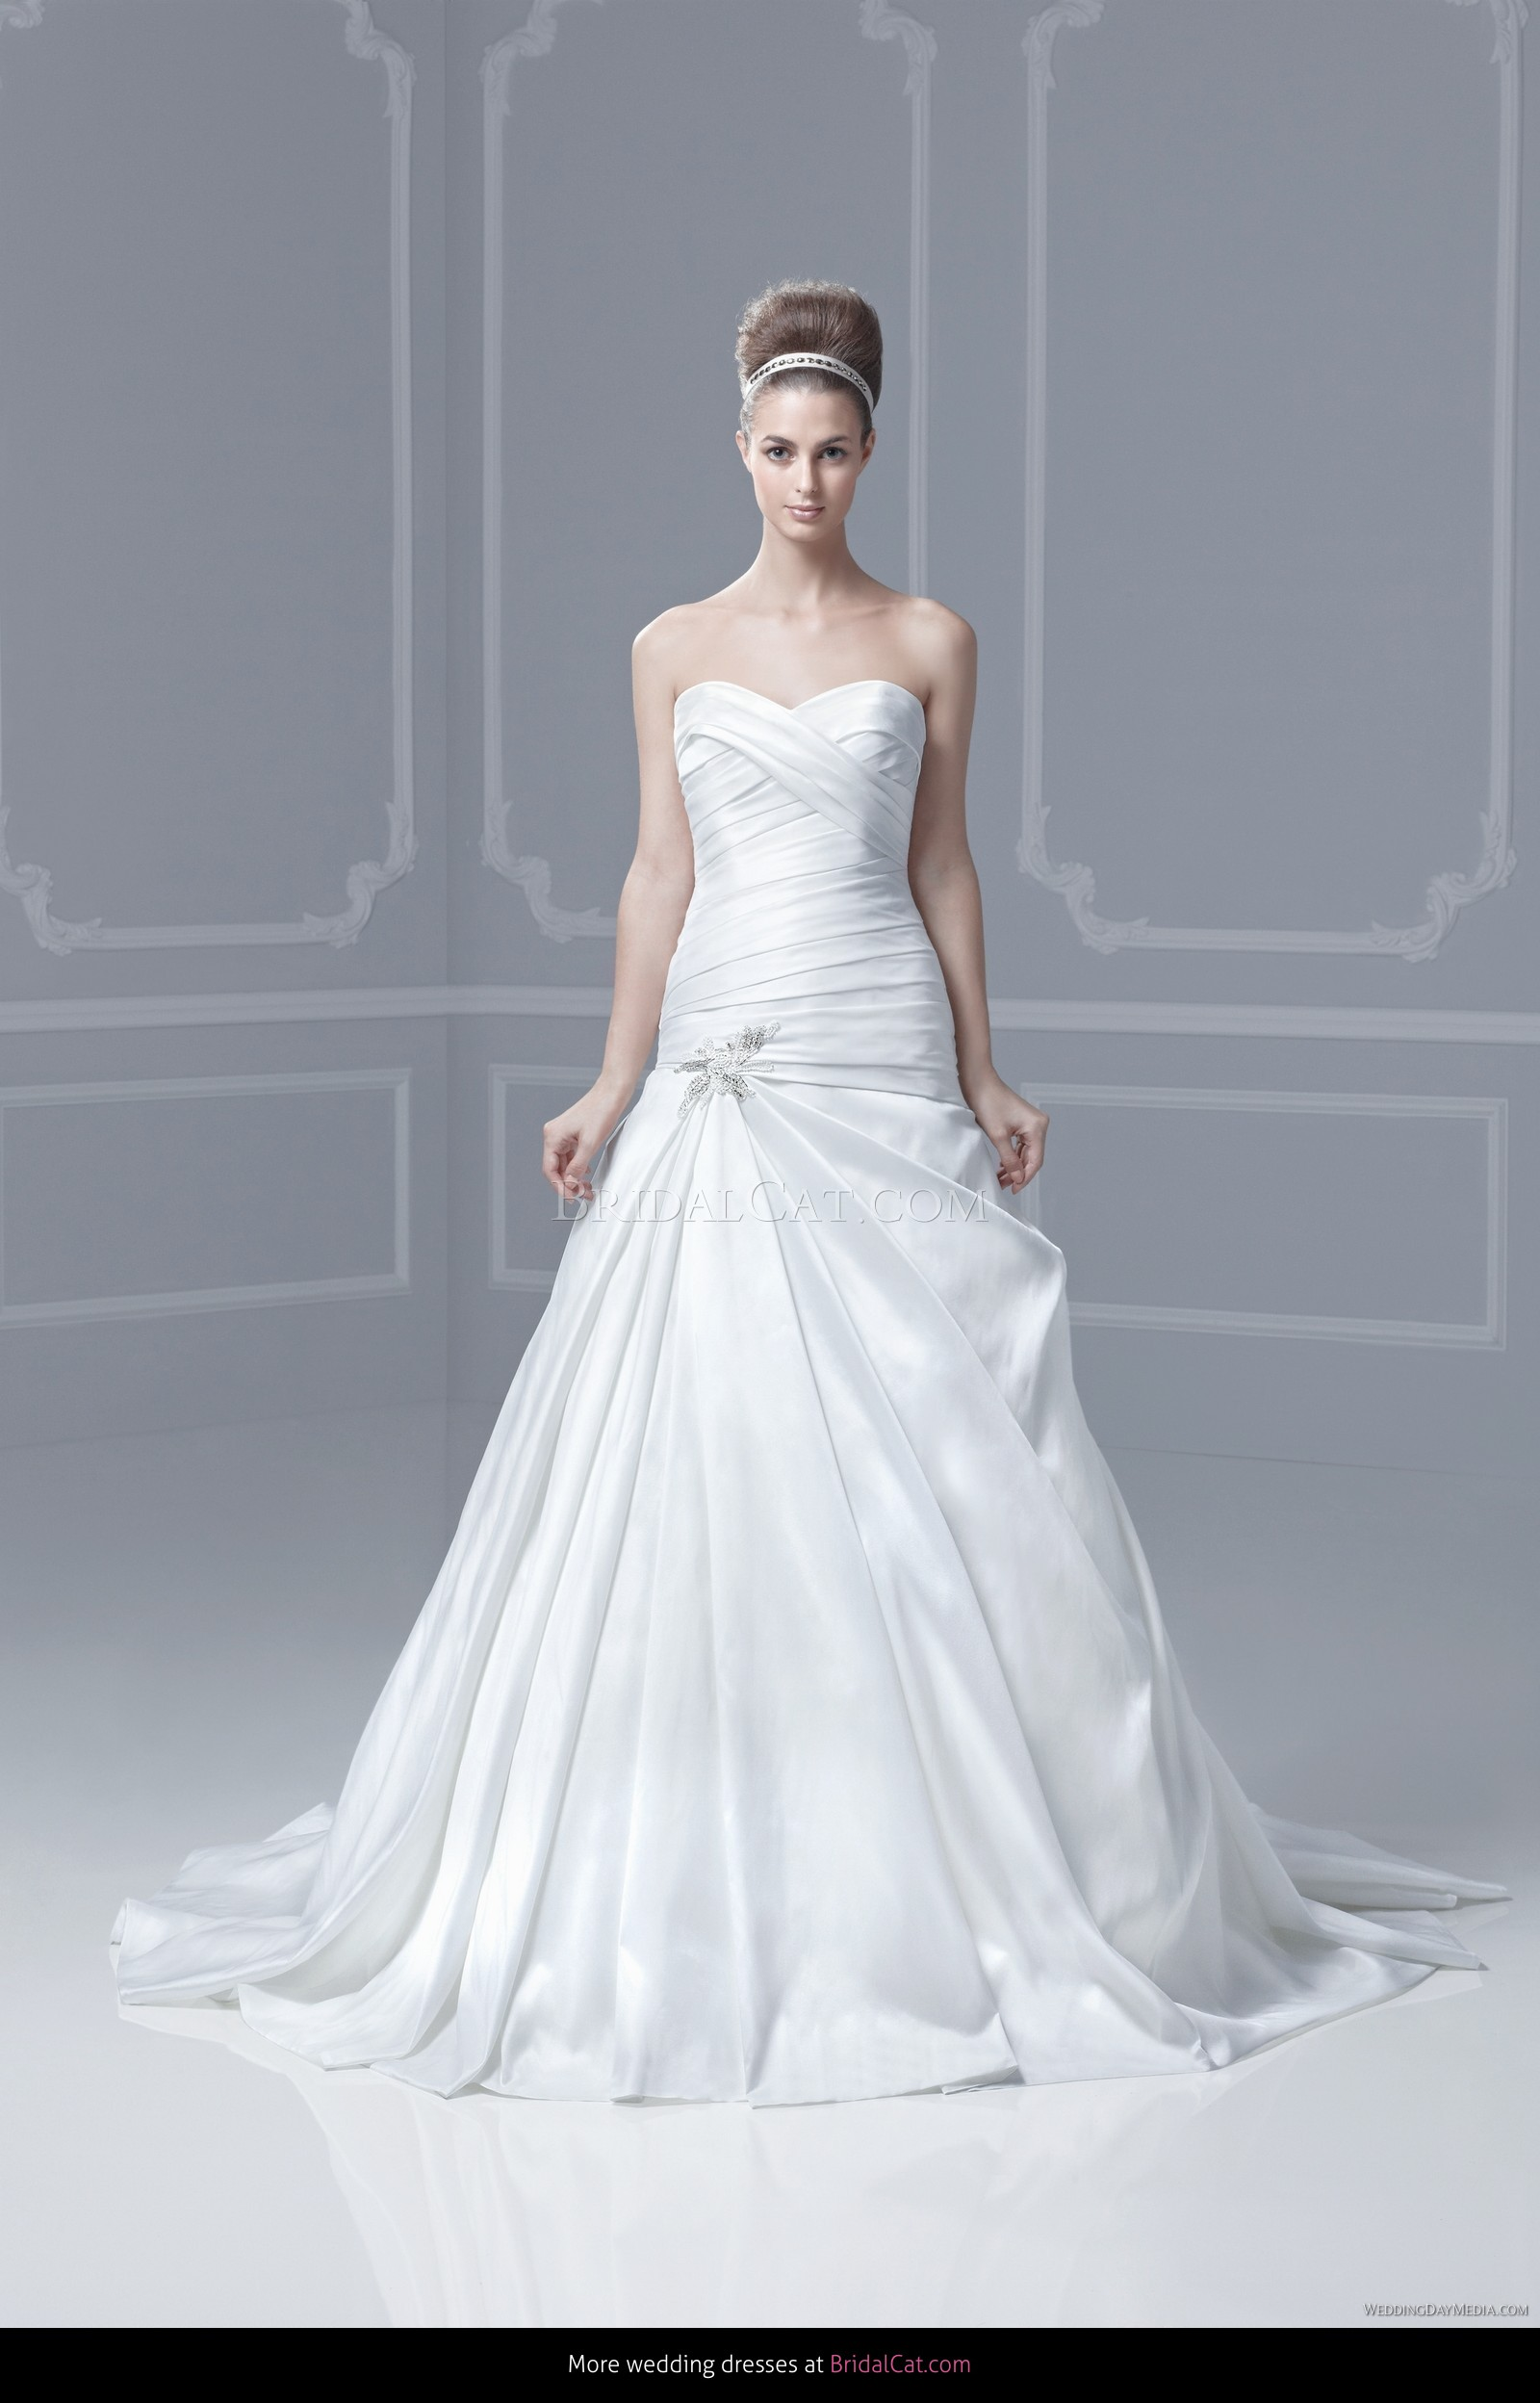 wedding dresses portland maine photo - 1